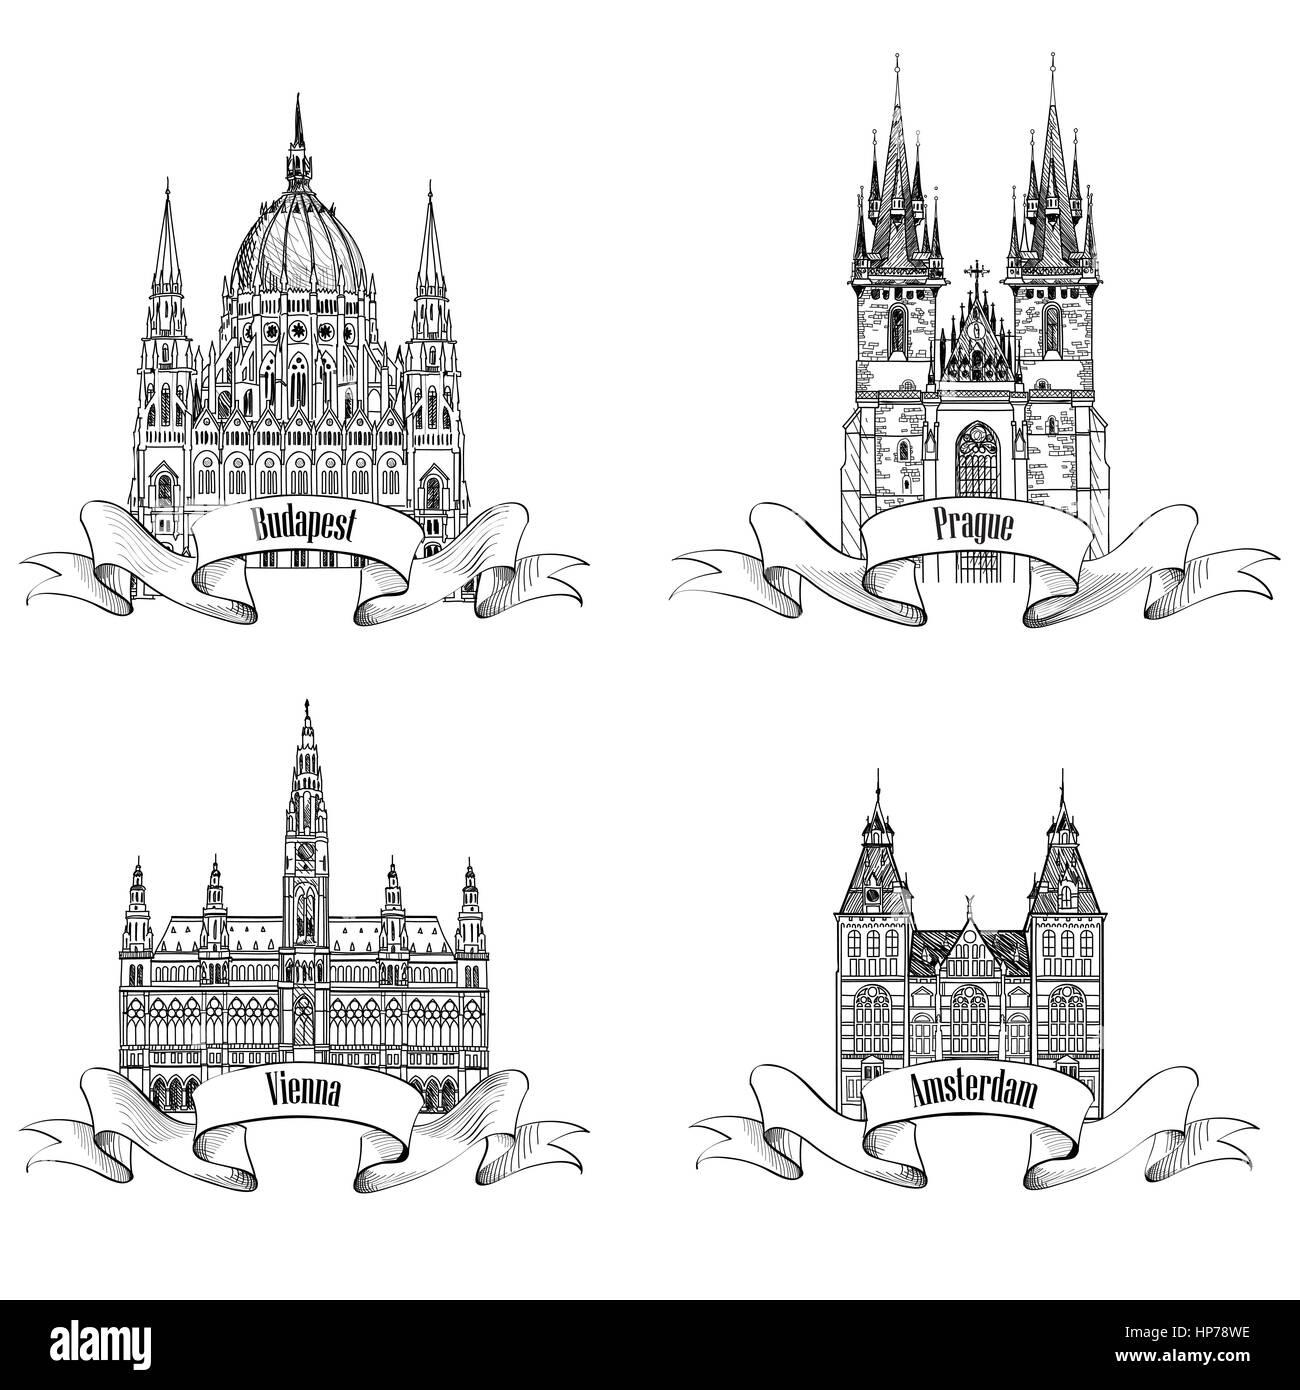 Amsterdam Symbol Stockfotos & Amsterdam Symbol Bilder - Alamy